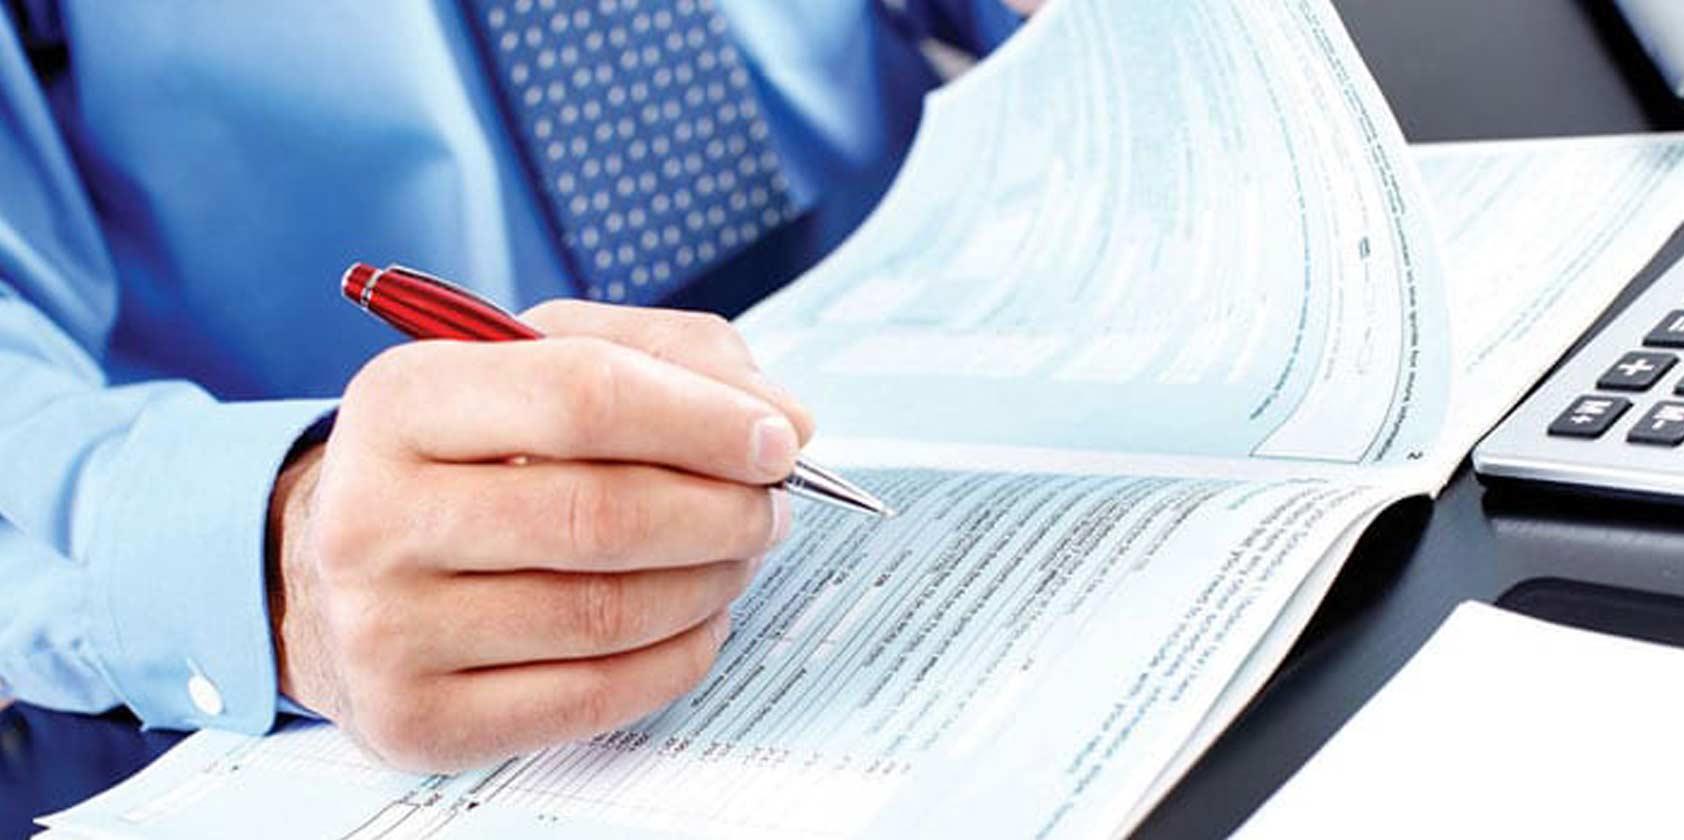 Accounting and Book-Keeping